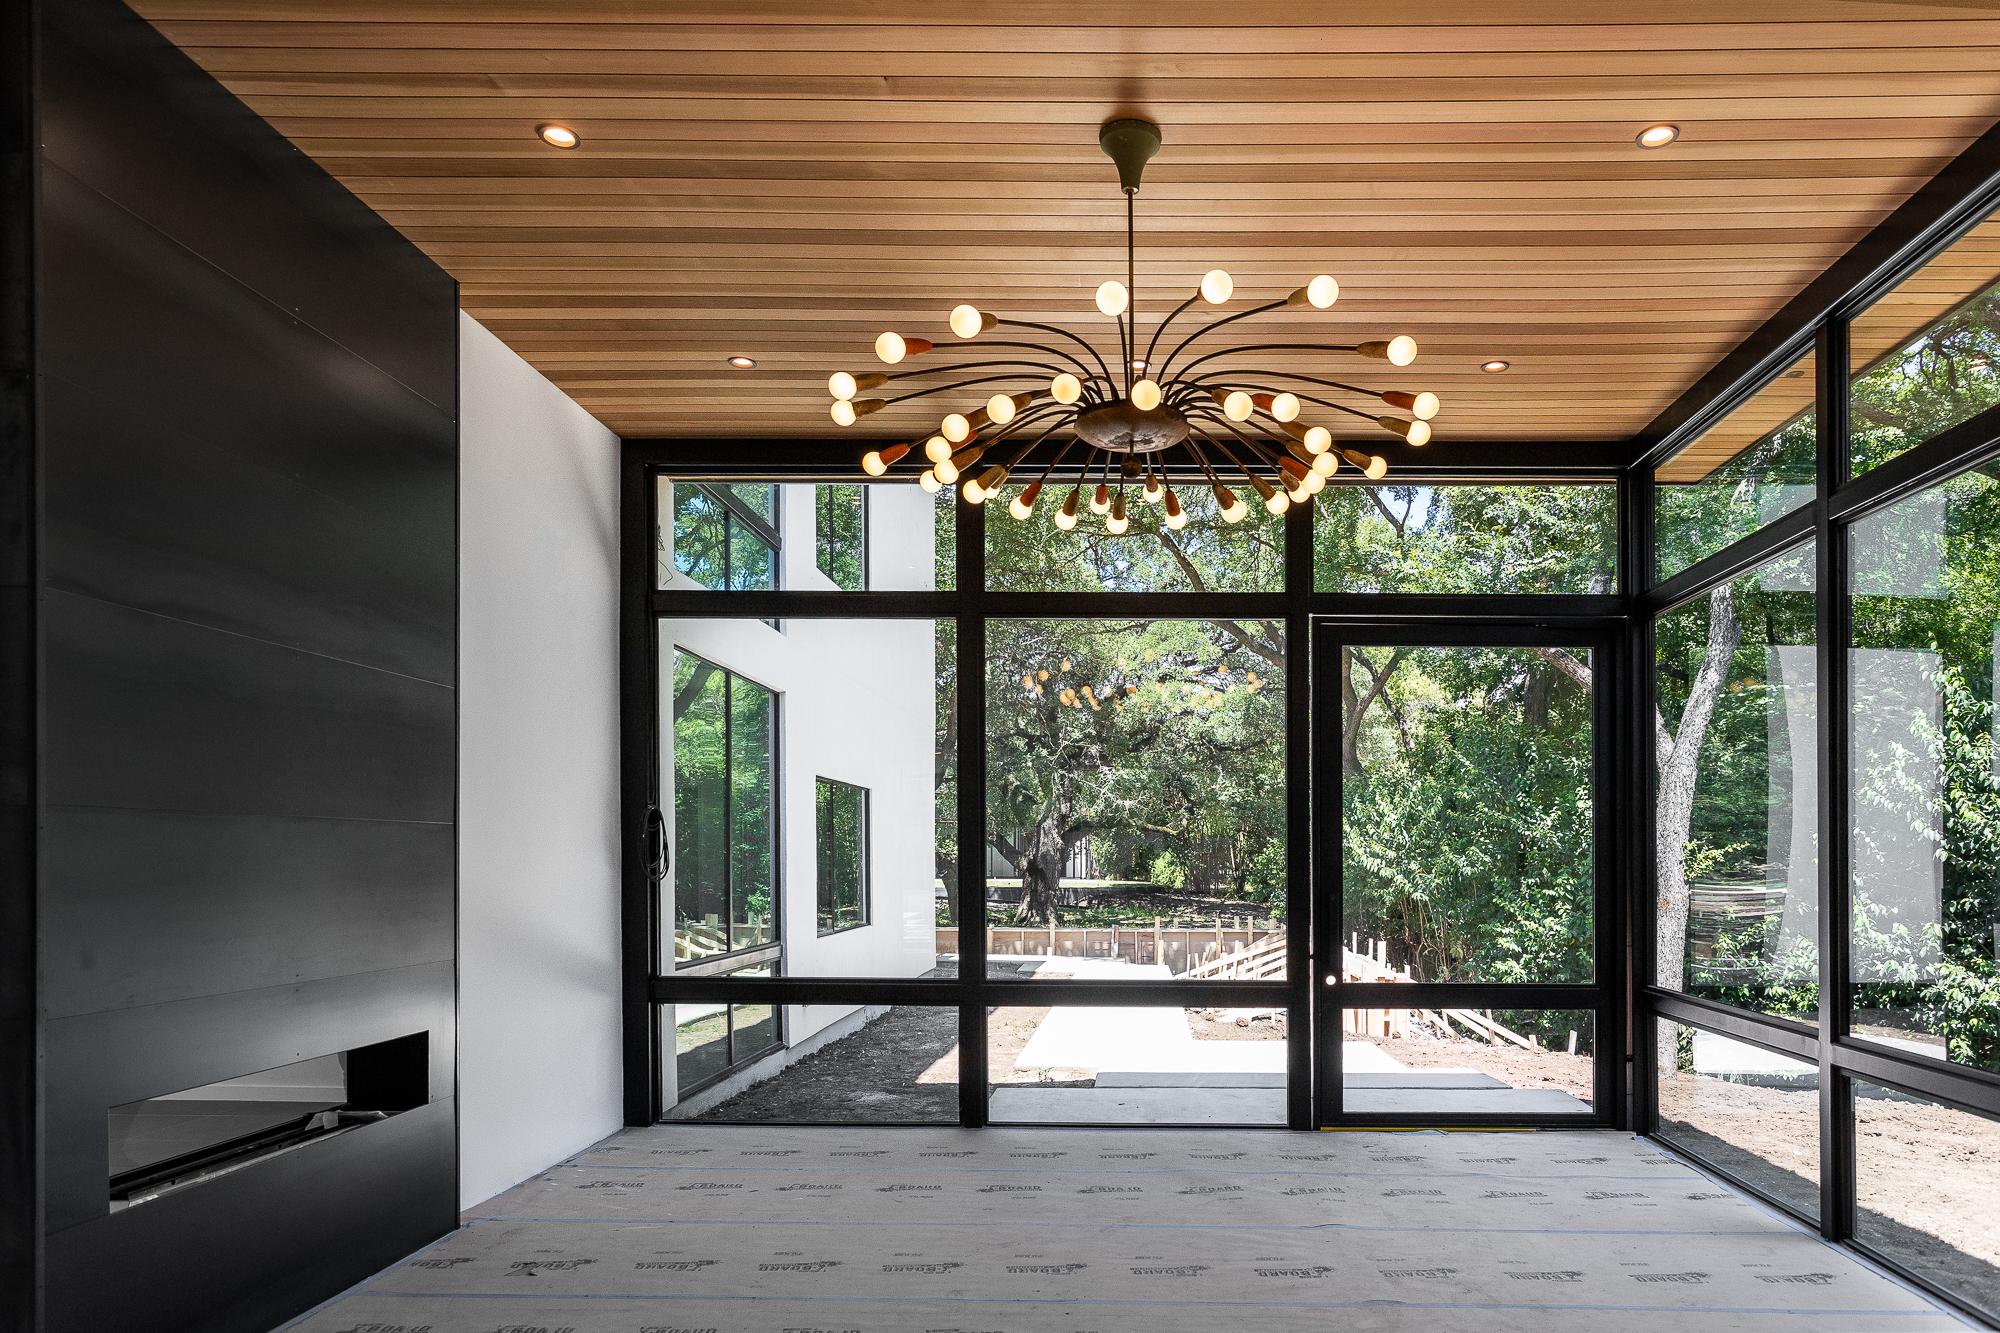 Woodridge-San-Antonio-Architecture-Photography-8.jpg